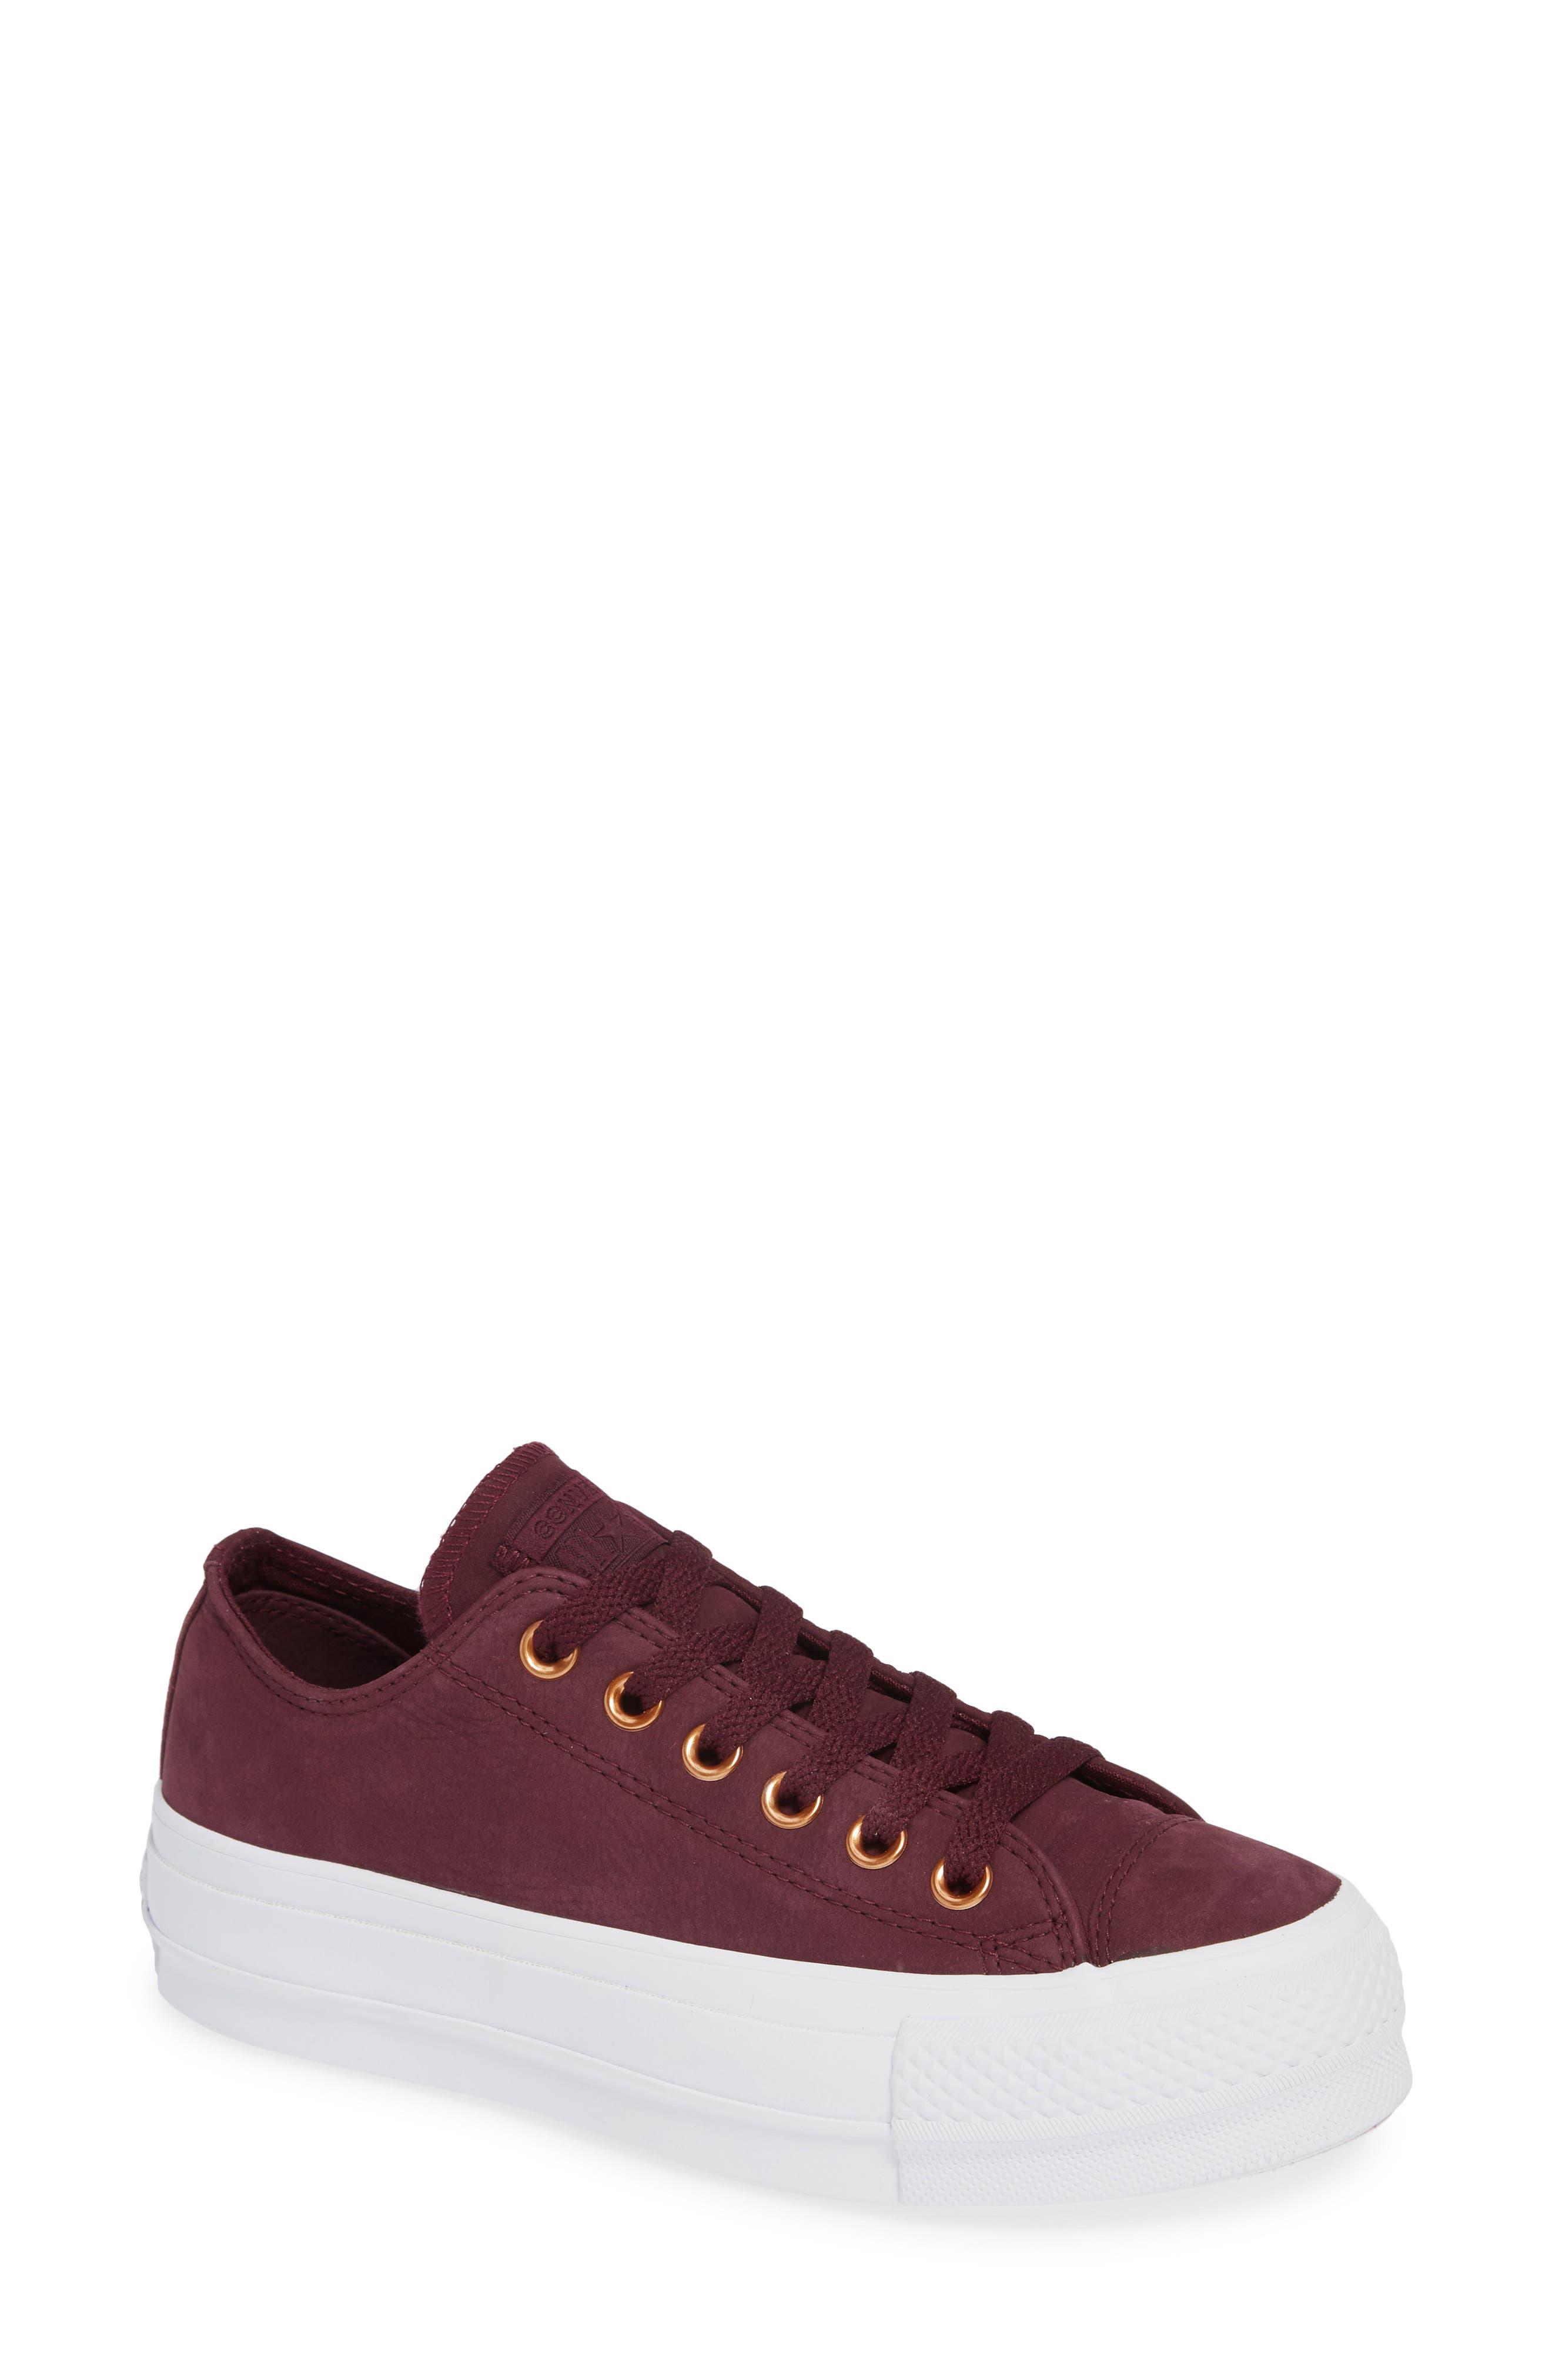 Chuck Taylor<sup>®</sup> All Star<sup>®</sup> Platform Sneaker,                         Main,                         color, Dark Sangria Nubuck